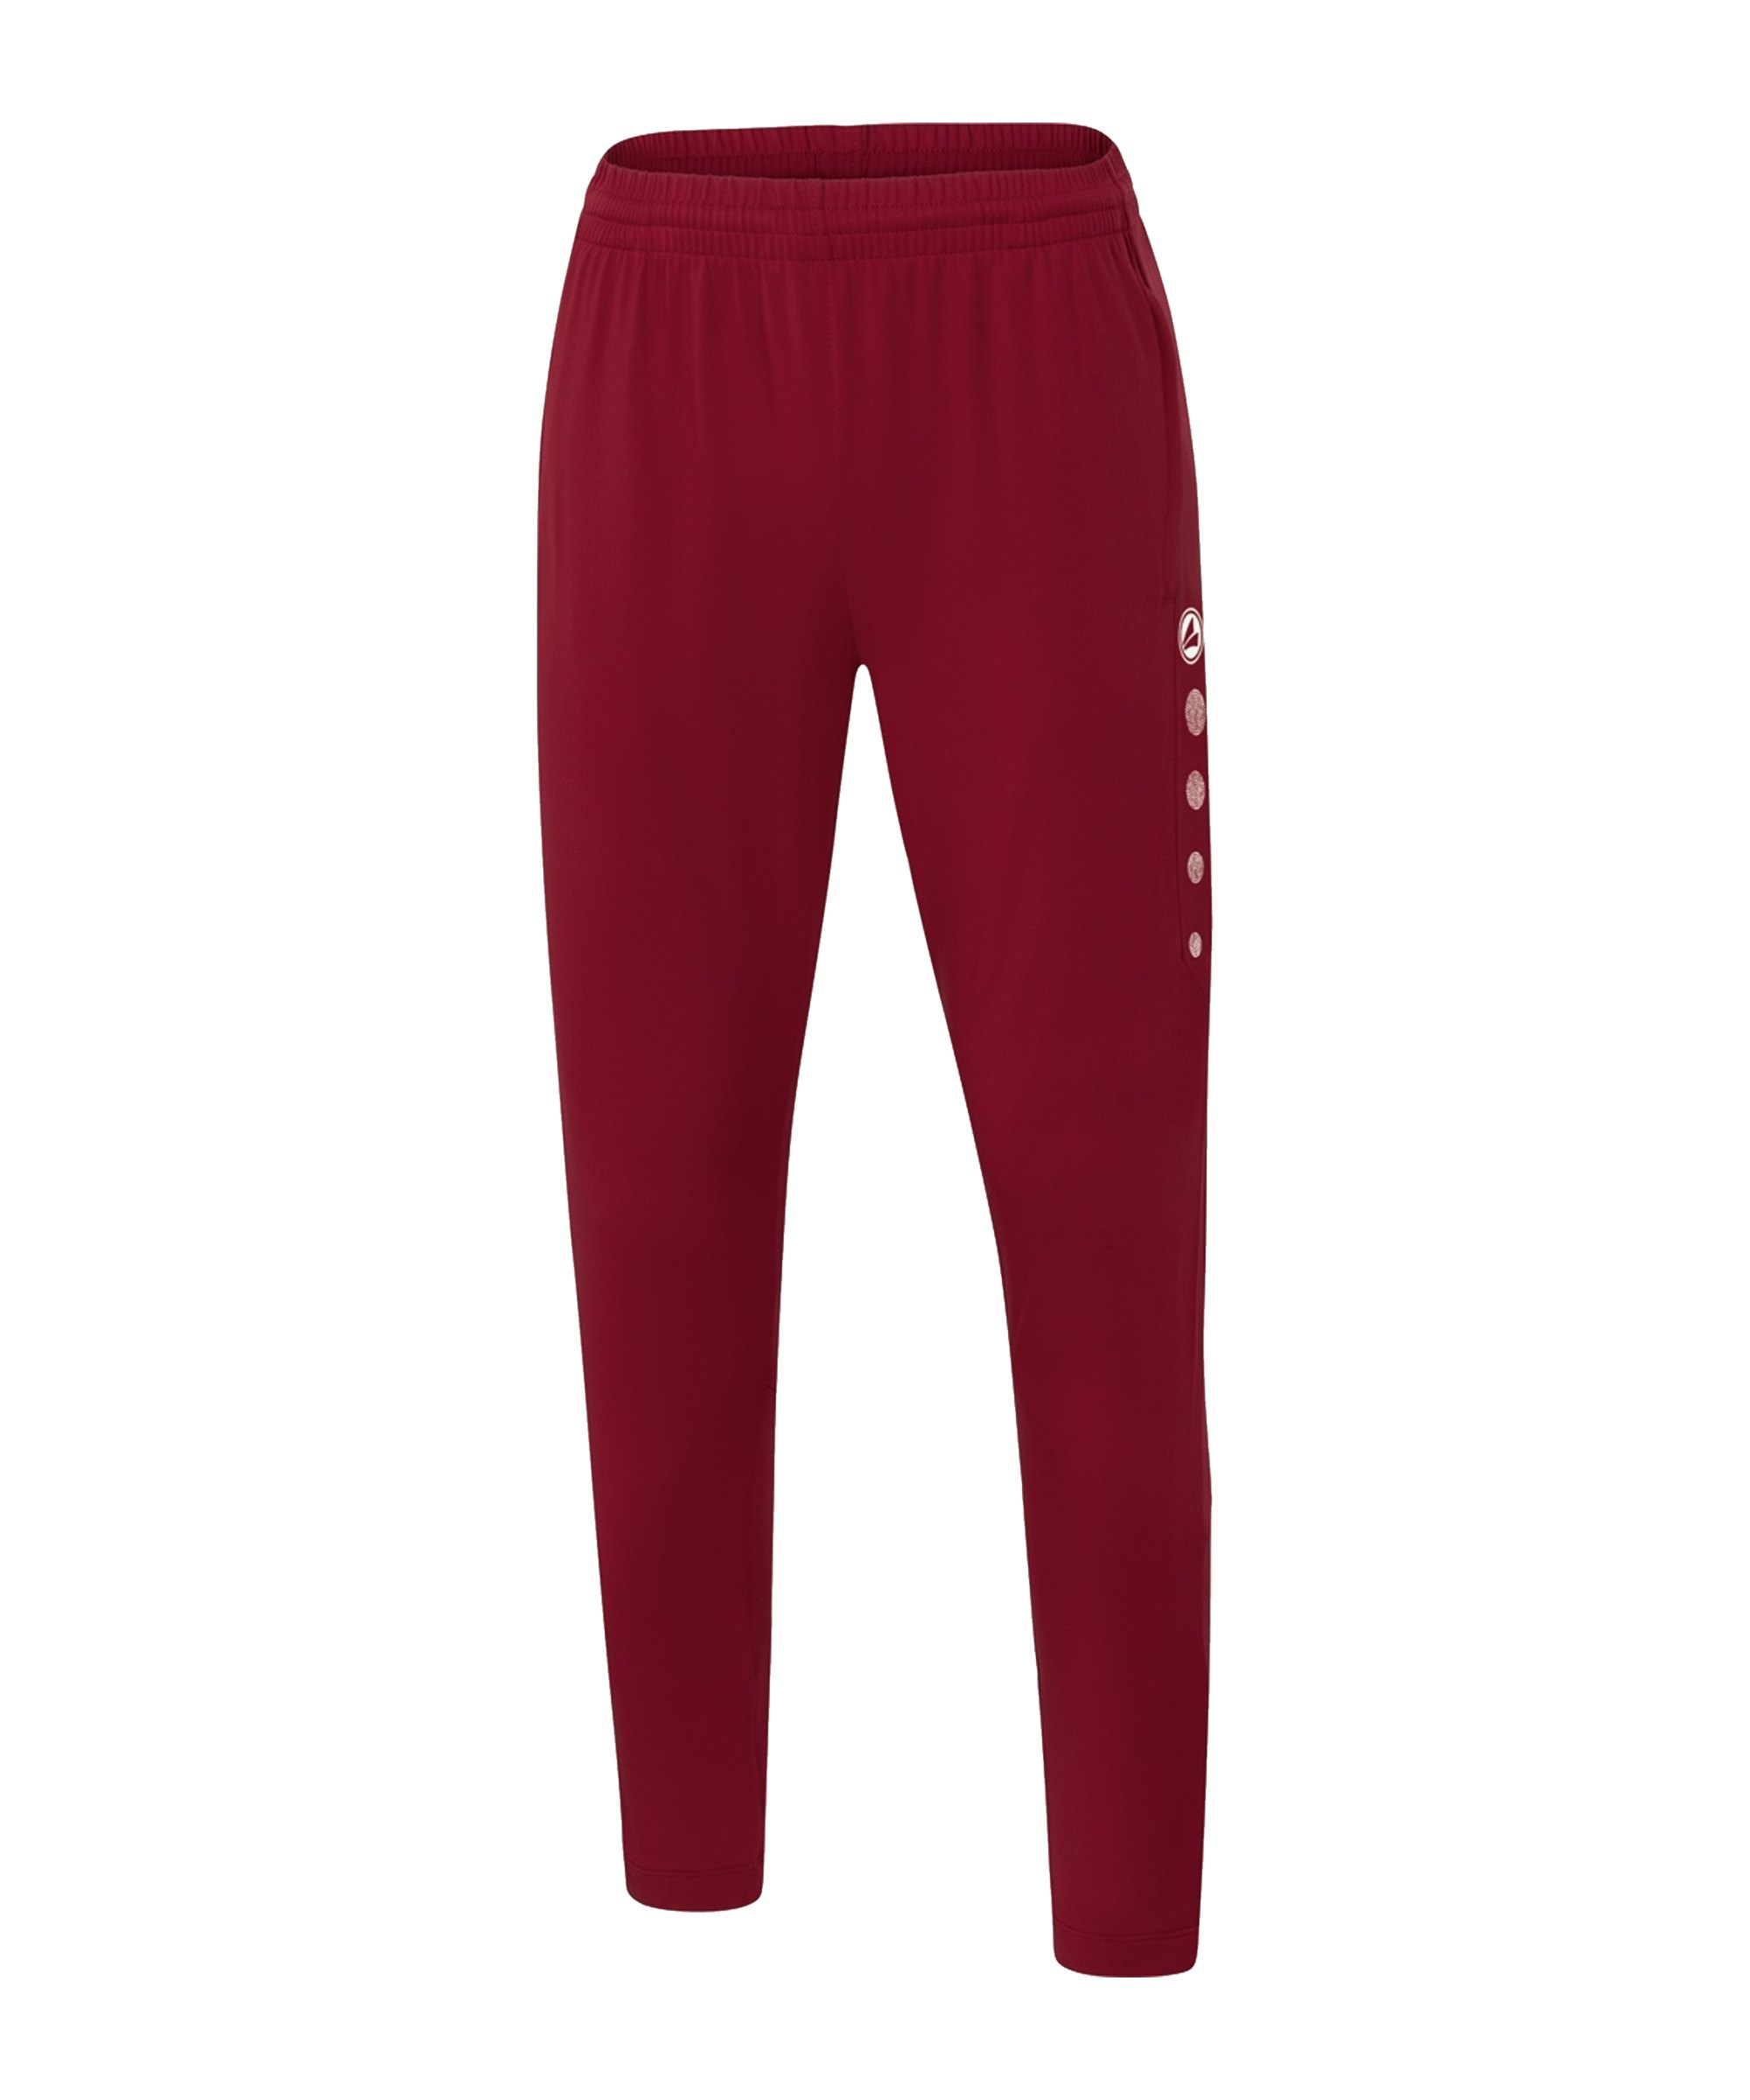 JAKO Premium Trainingshose Damen Rot F01 - rot